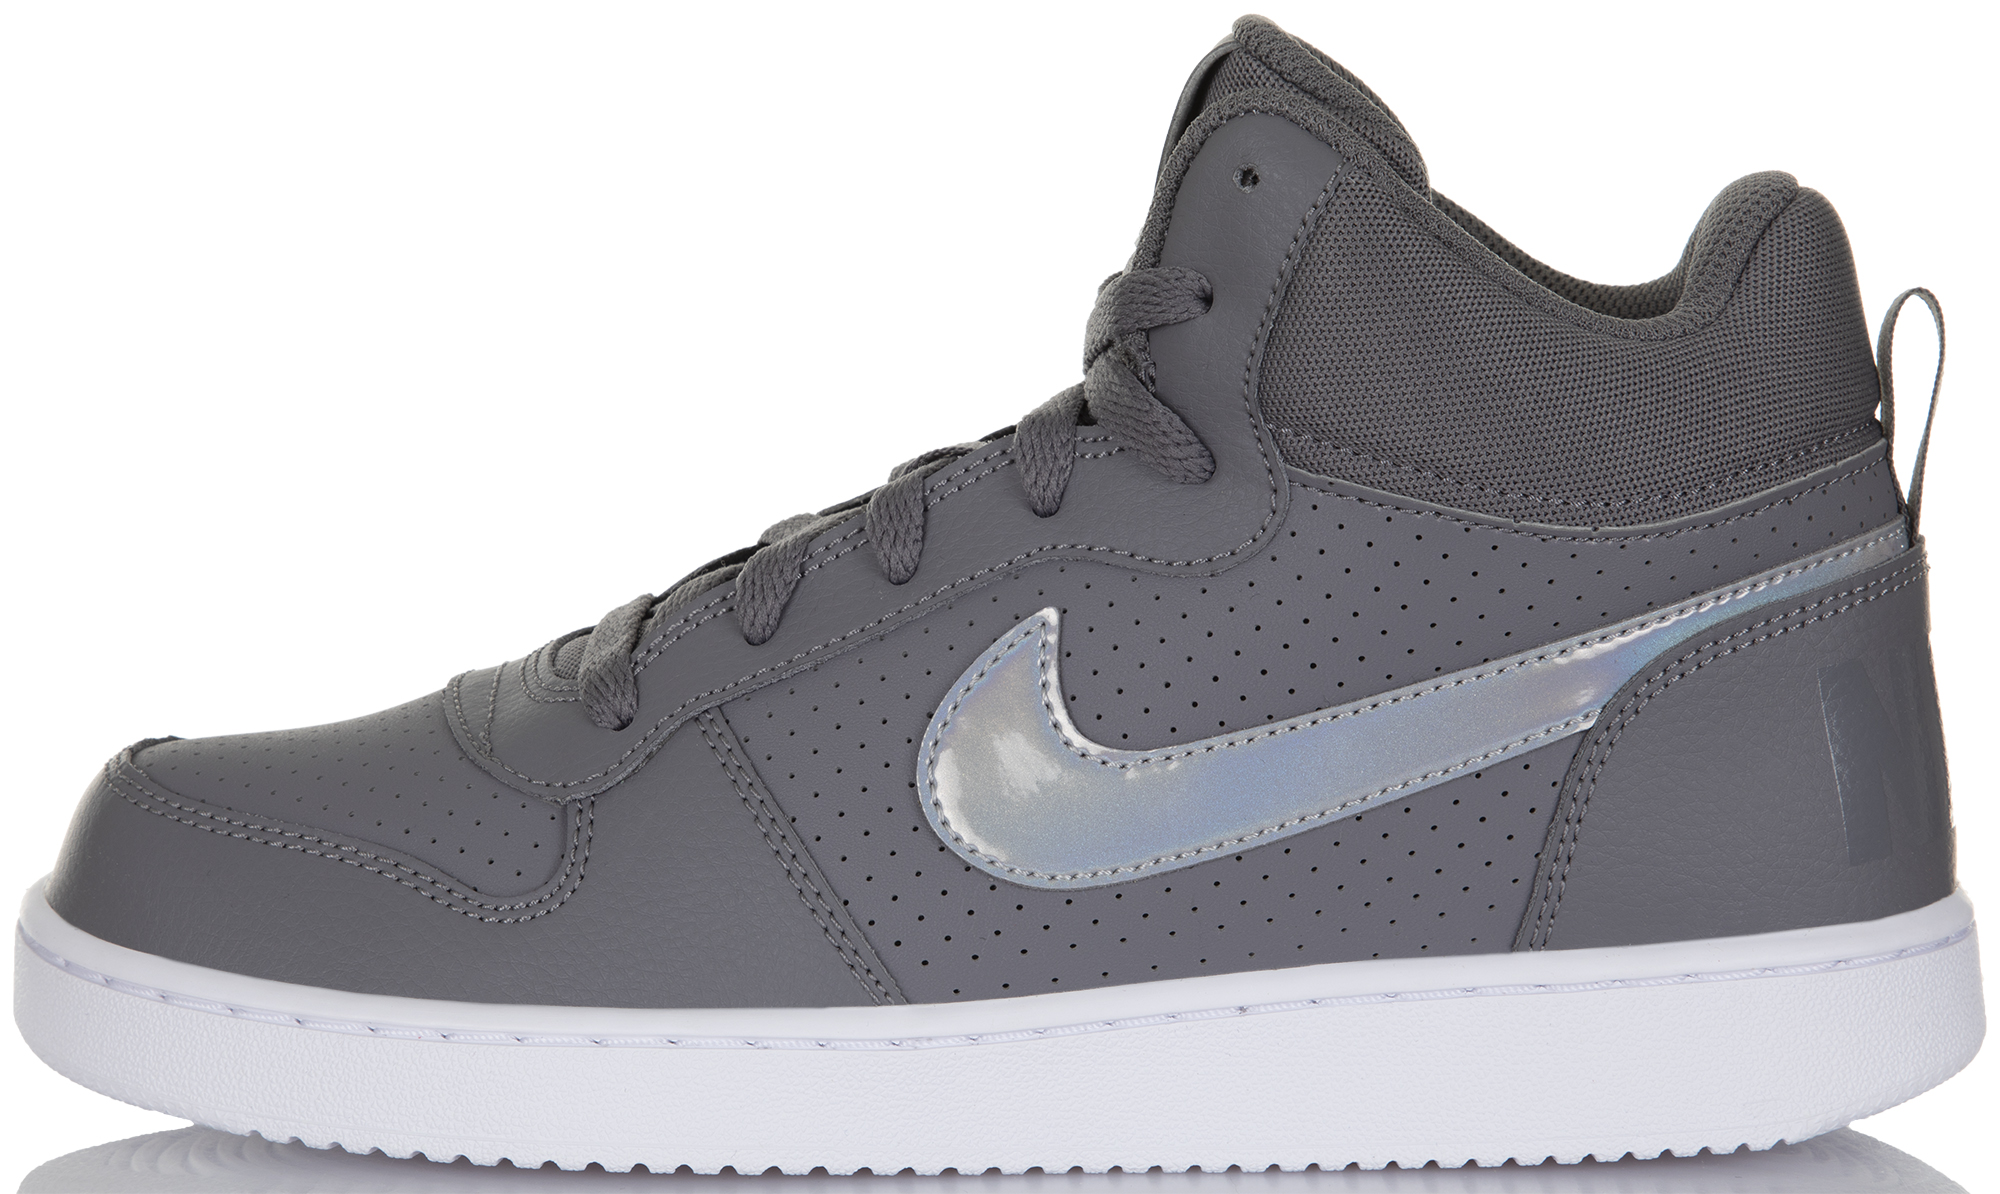 Nike Кеды для девочек Nike Court Borough Mid, размер 37,5